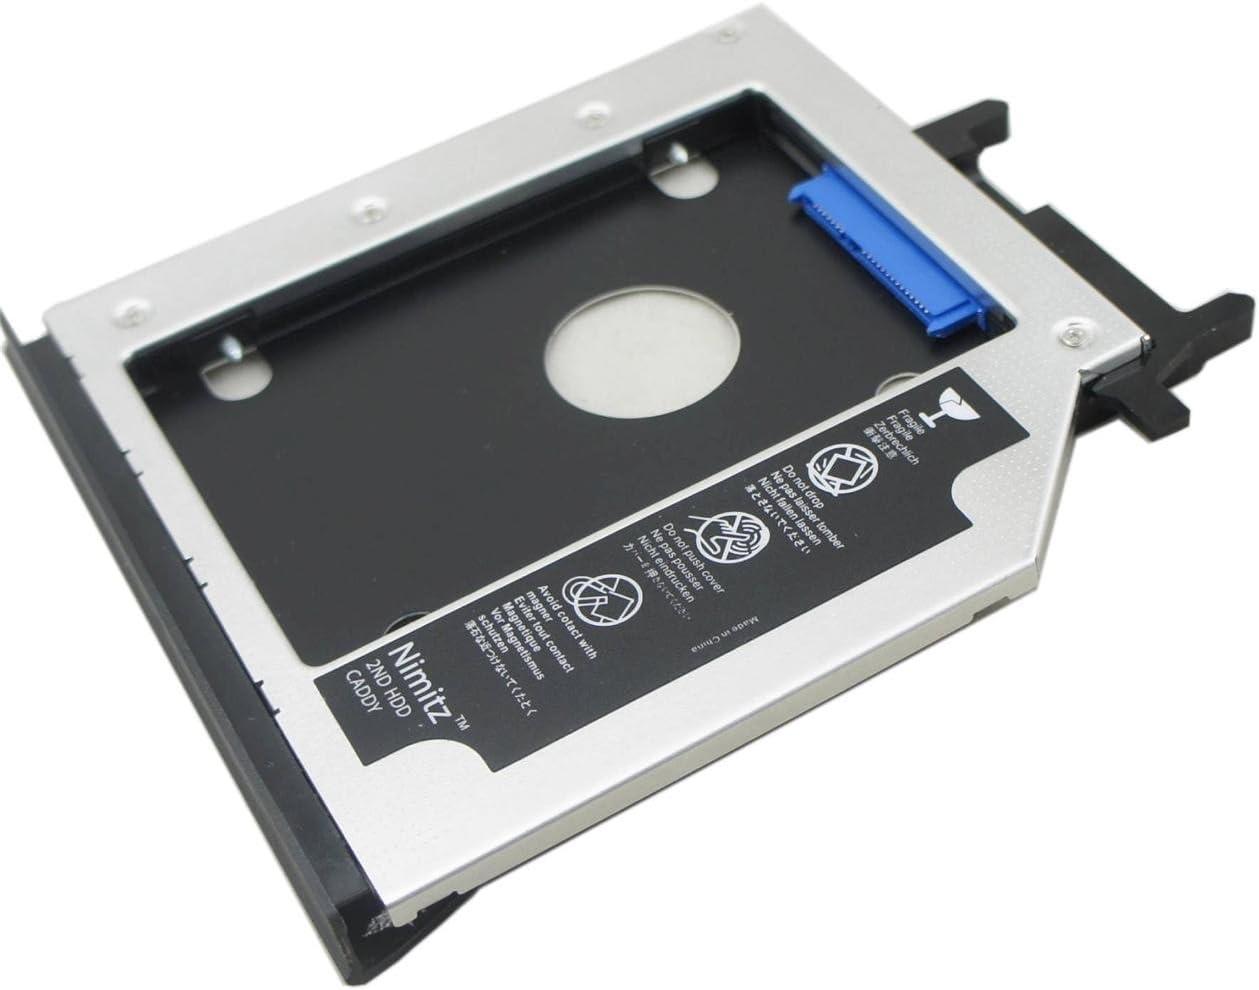 2nd HDD disco duro SSD Nimitz luxtons para Lenovo Ideapad Y500 ...